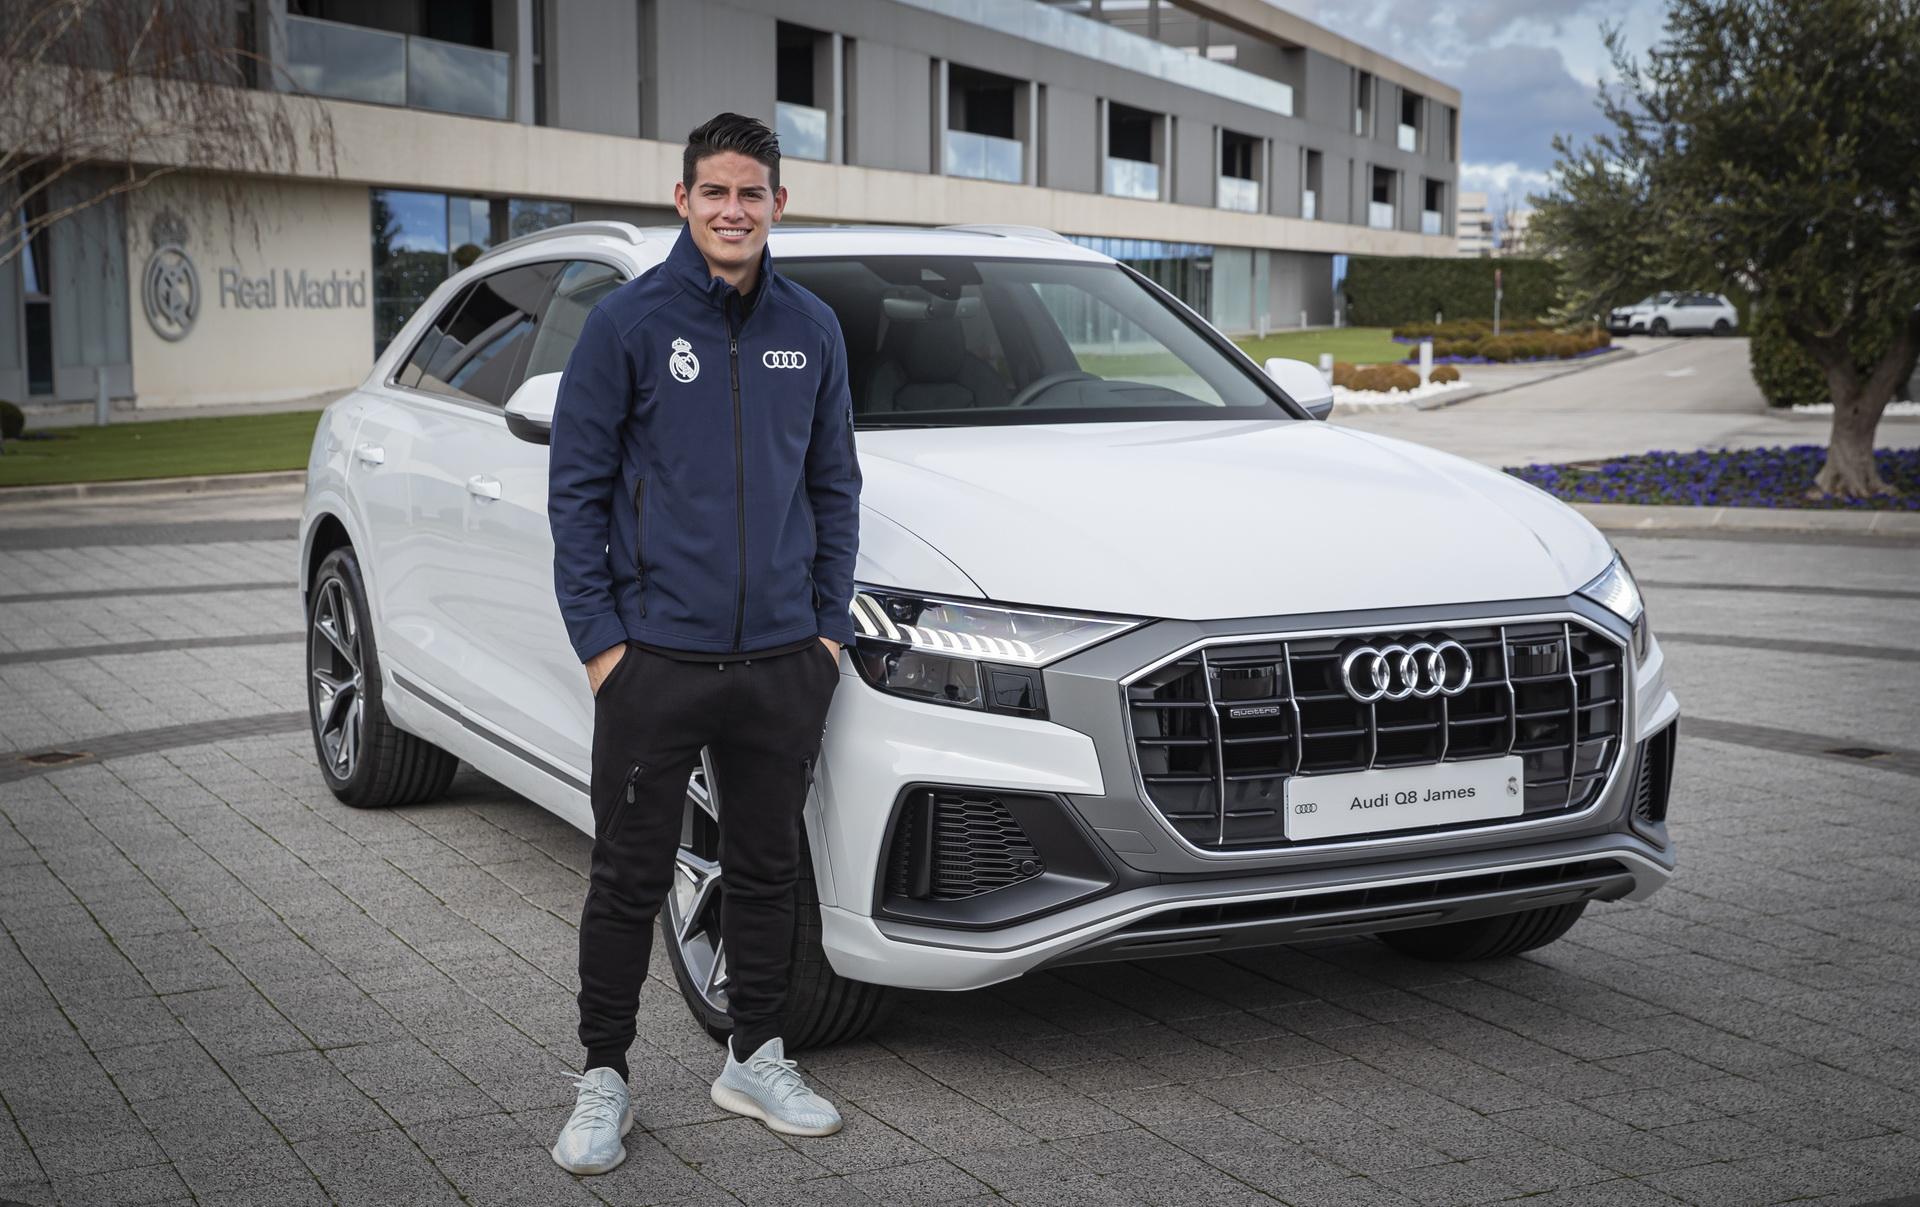 Real_Madrid_Players_Audi_0030